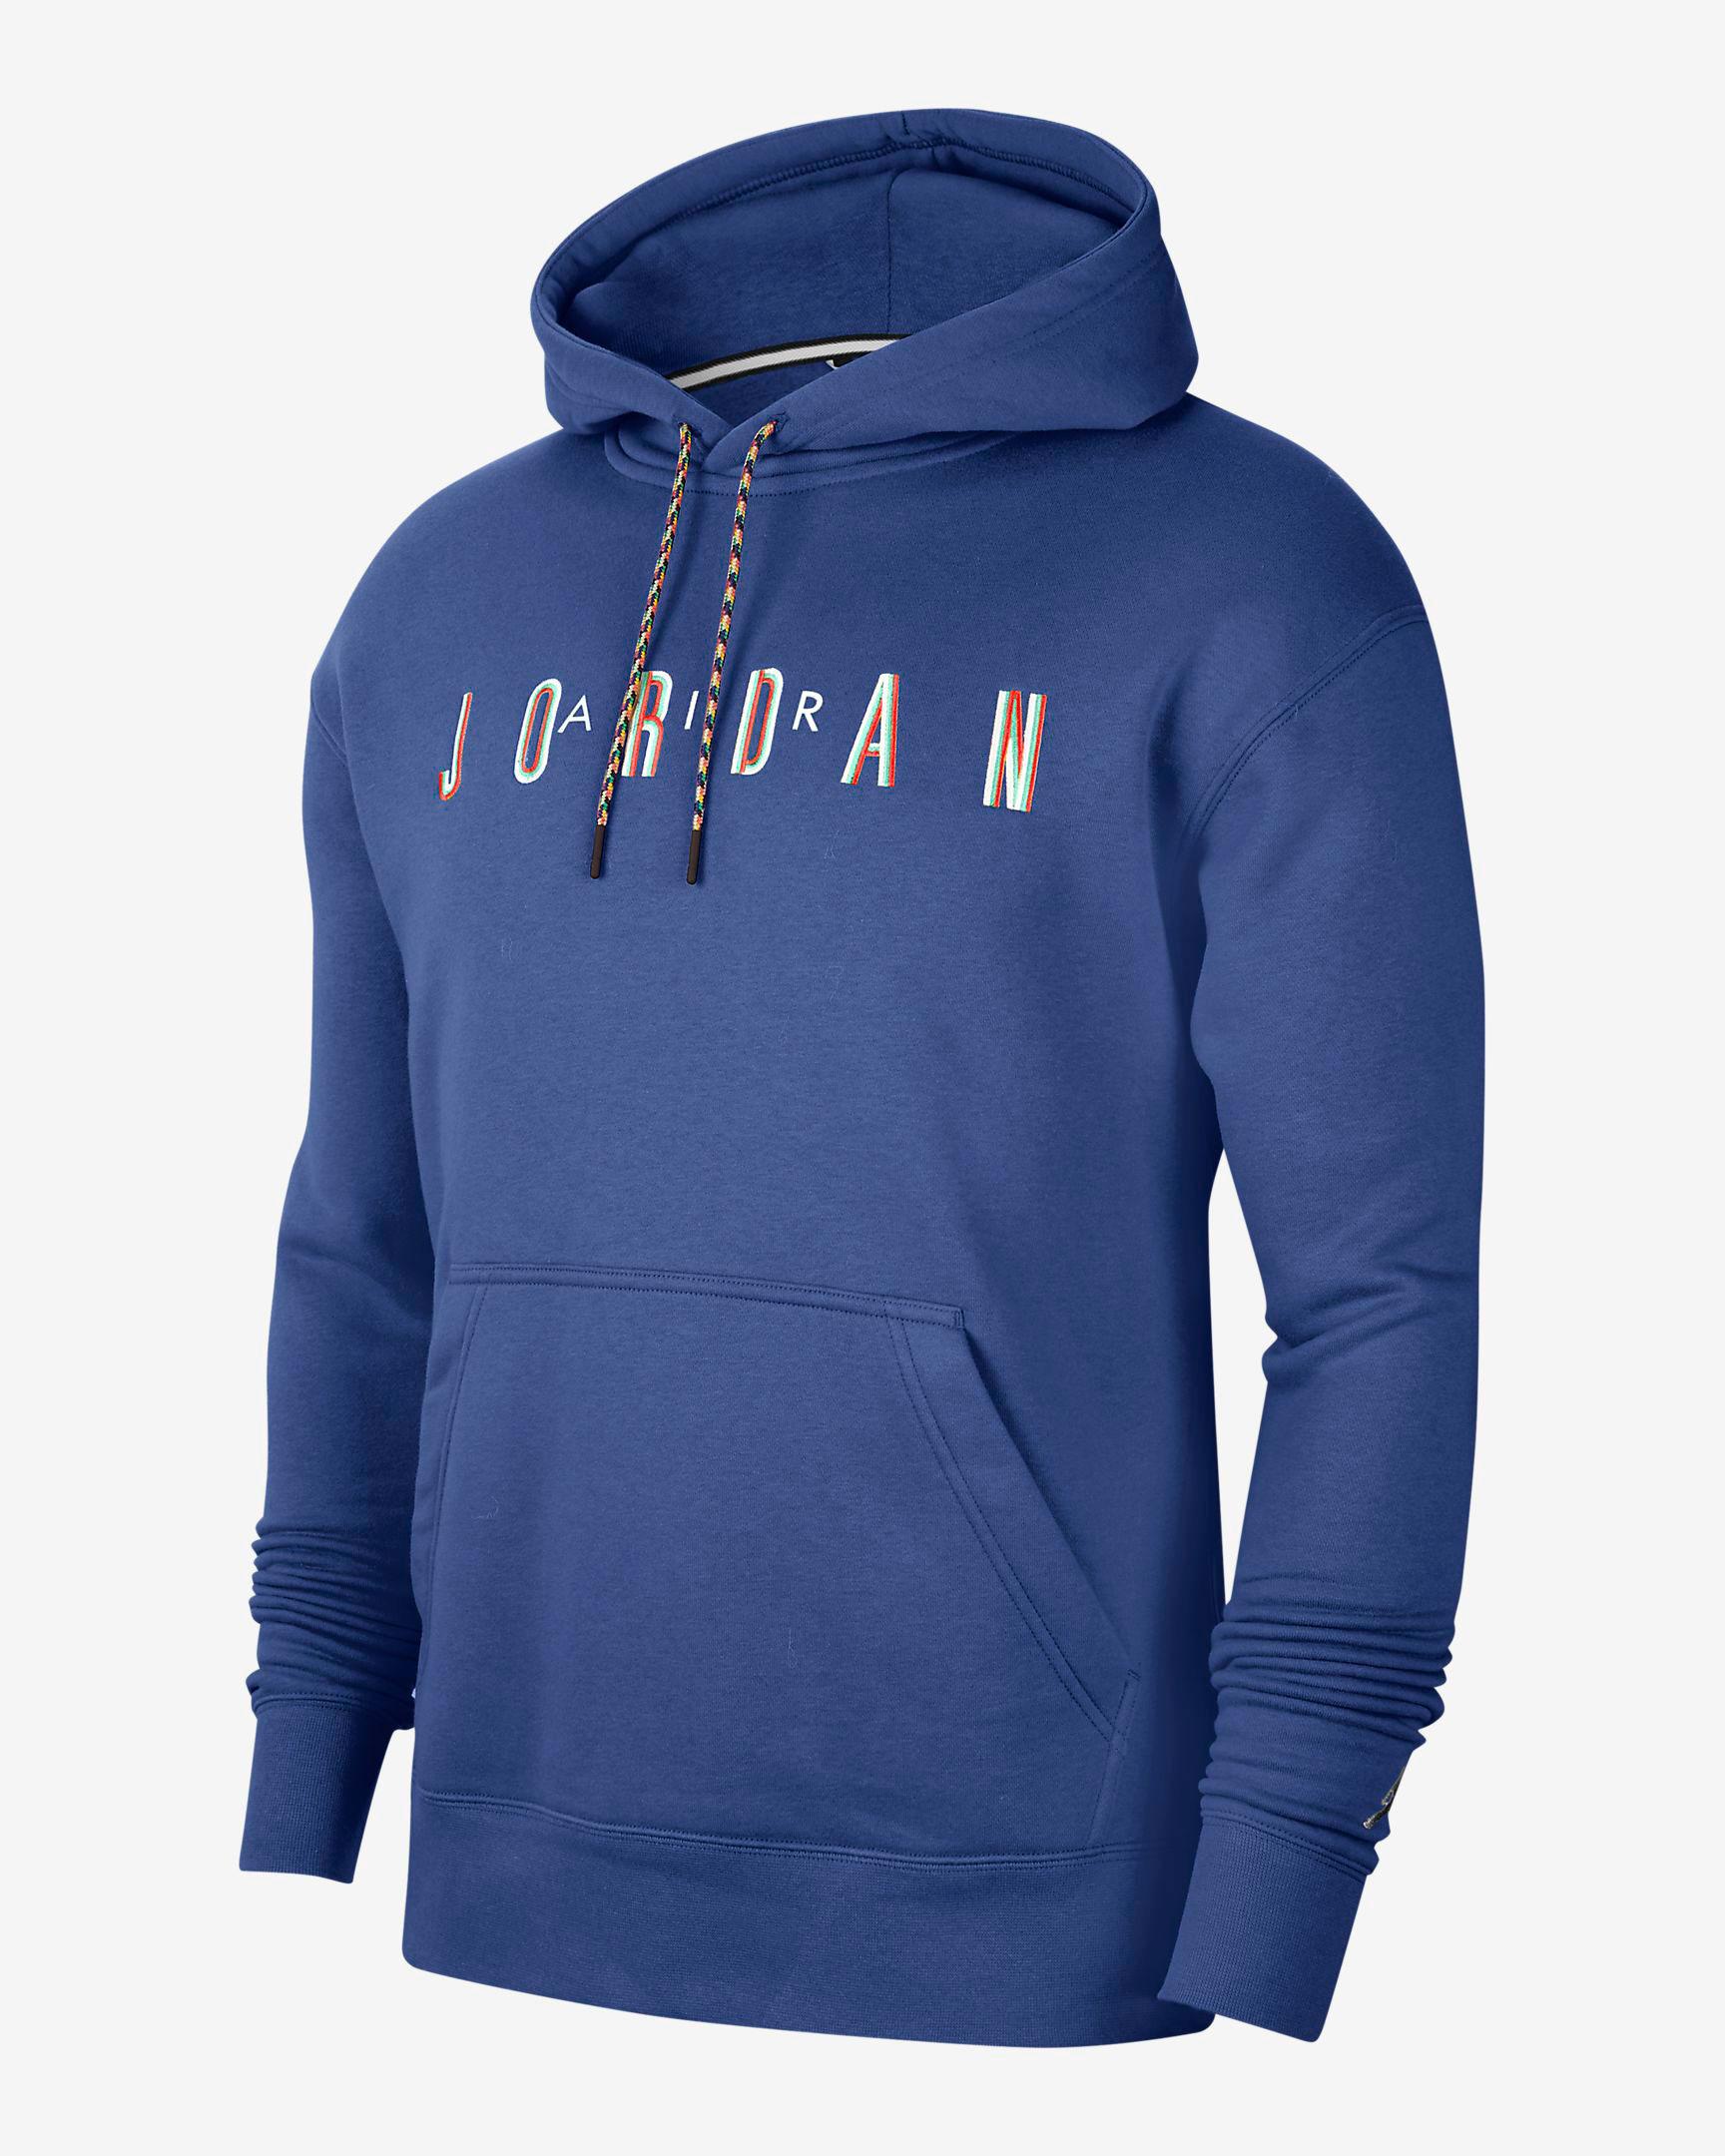 jordan-sport-dna-hoodie-blue-infrared